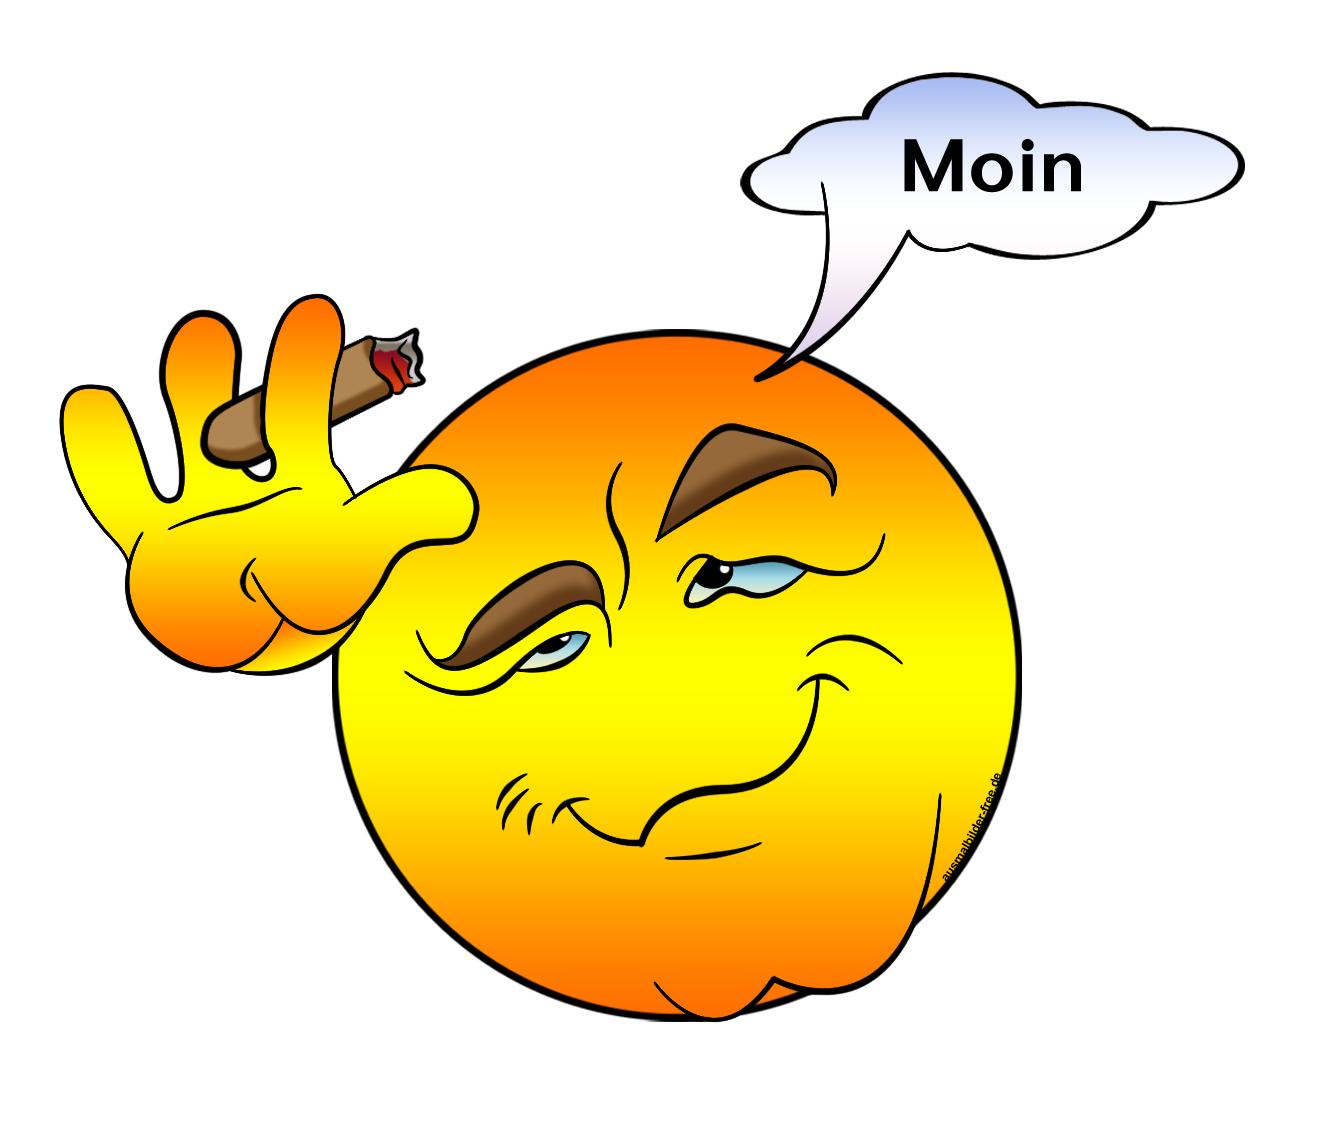 094-smiley-sprueche-sprichwoerter-zitate-moin-....png